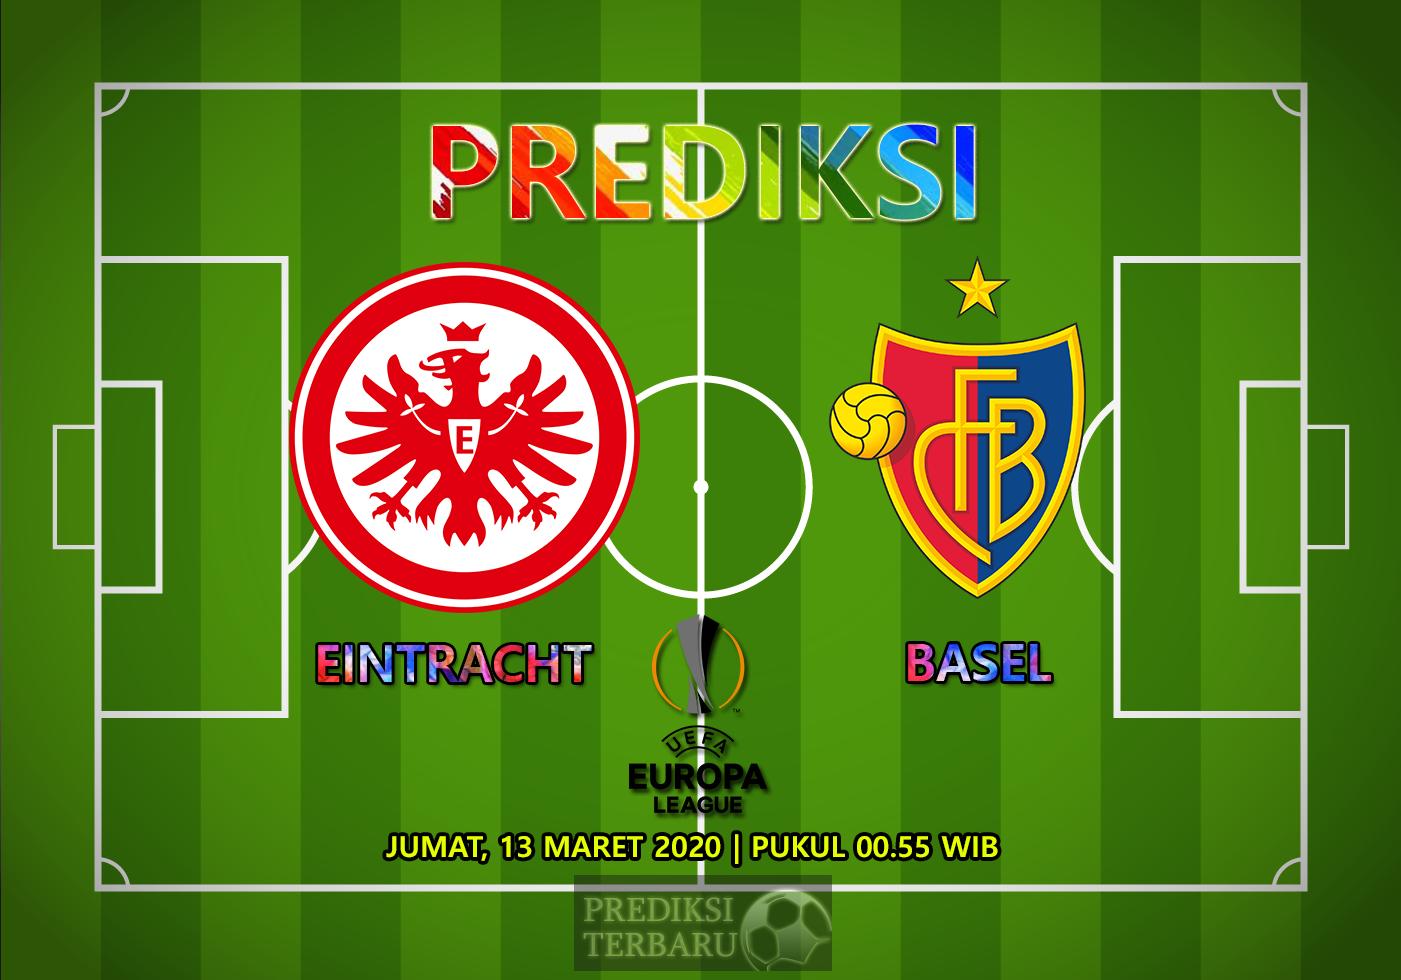 Prediksi Eintracht Frankfurt Vs Basel Jumat 13 Maret